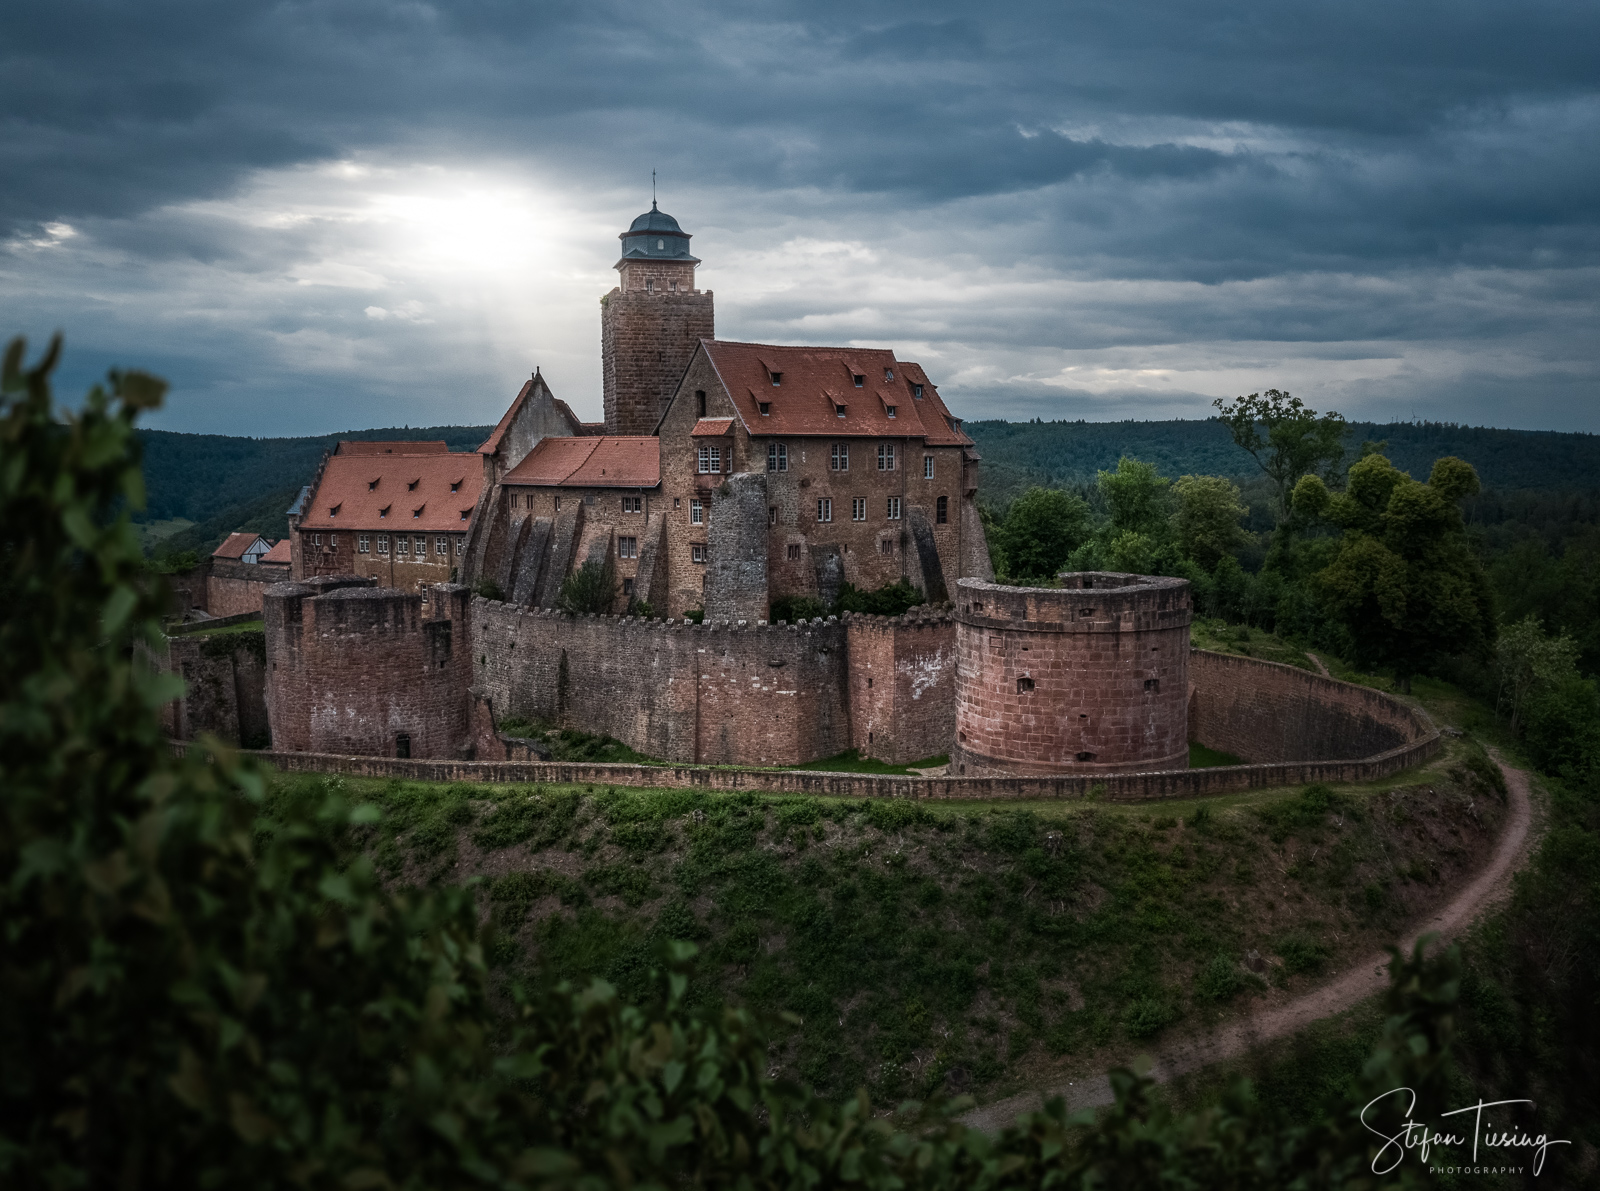 Burg Breuberg / Breuberg Castle